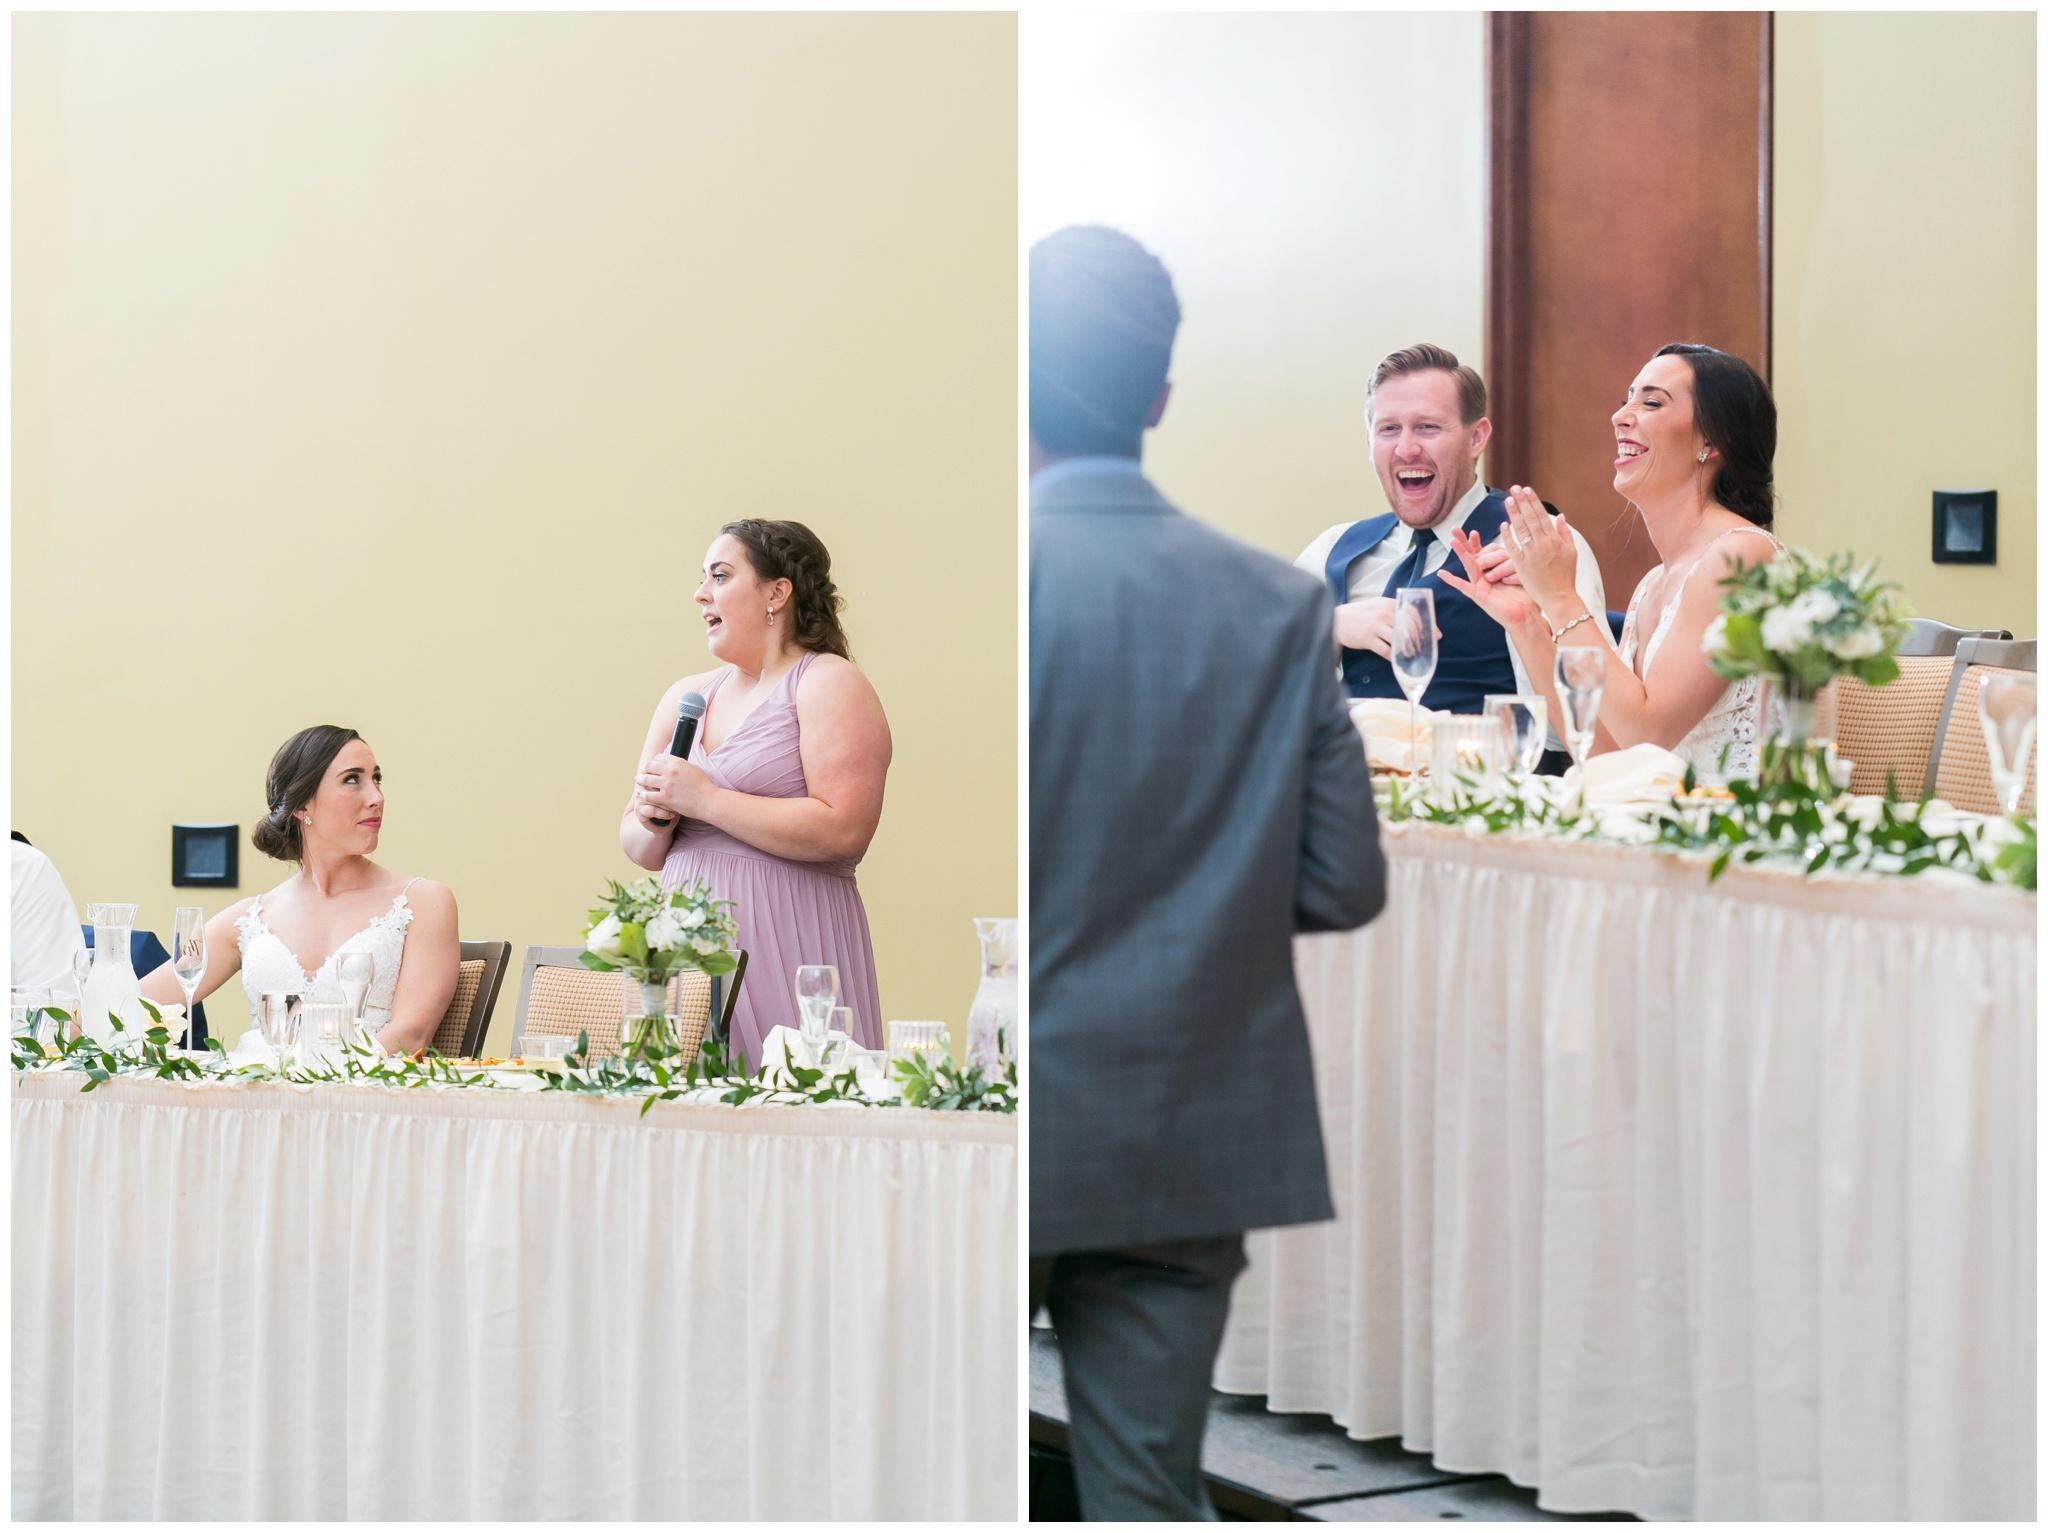 Union_south_Wedding_Madison_Wisconsin_Caynay_Photo_3690.jpg